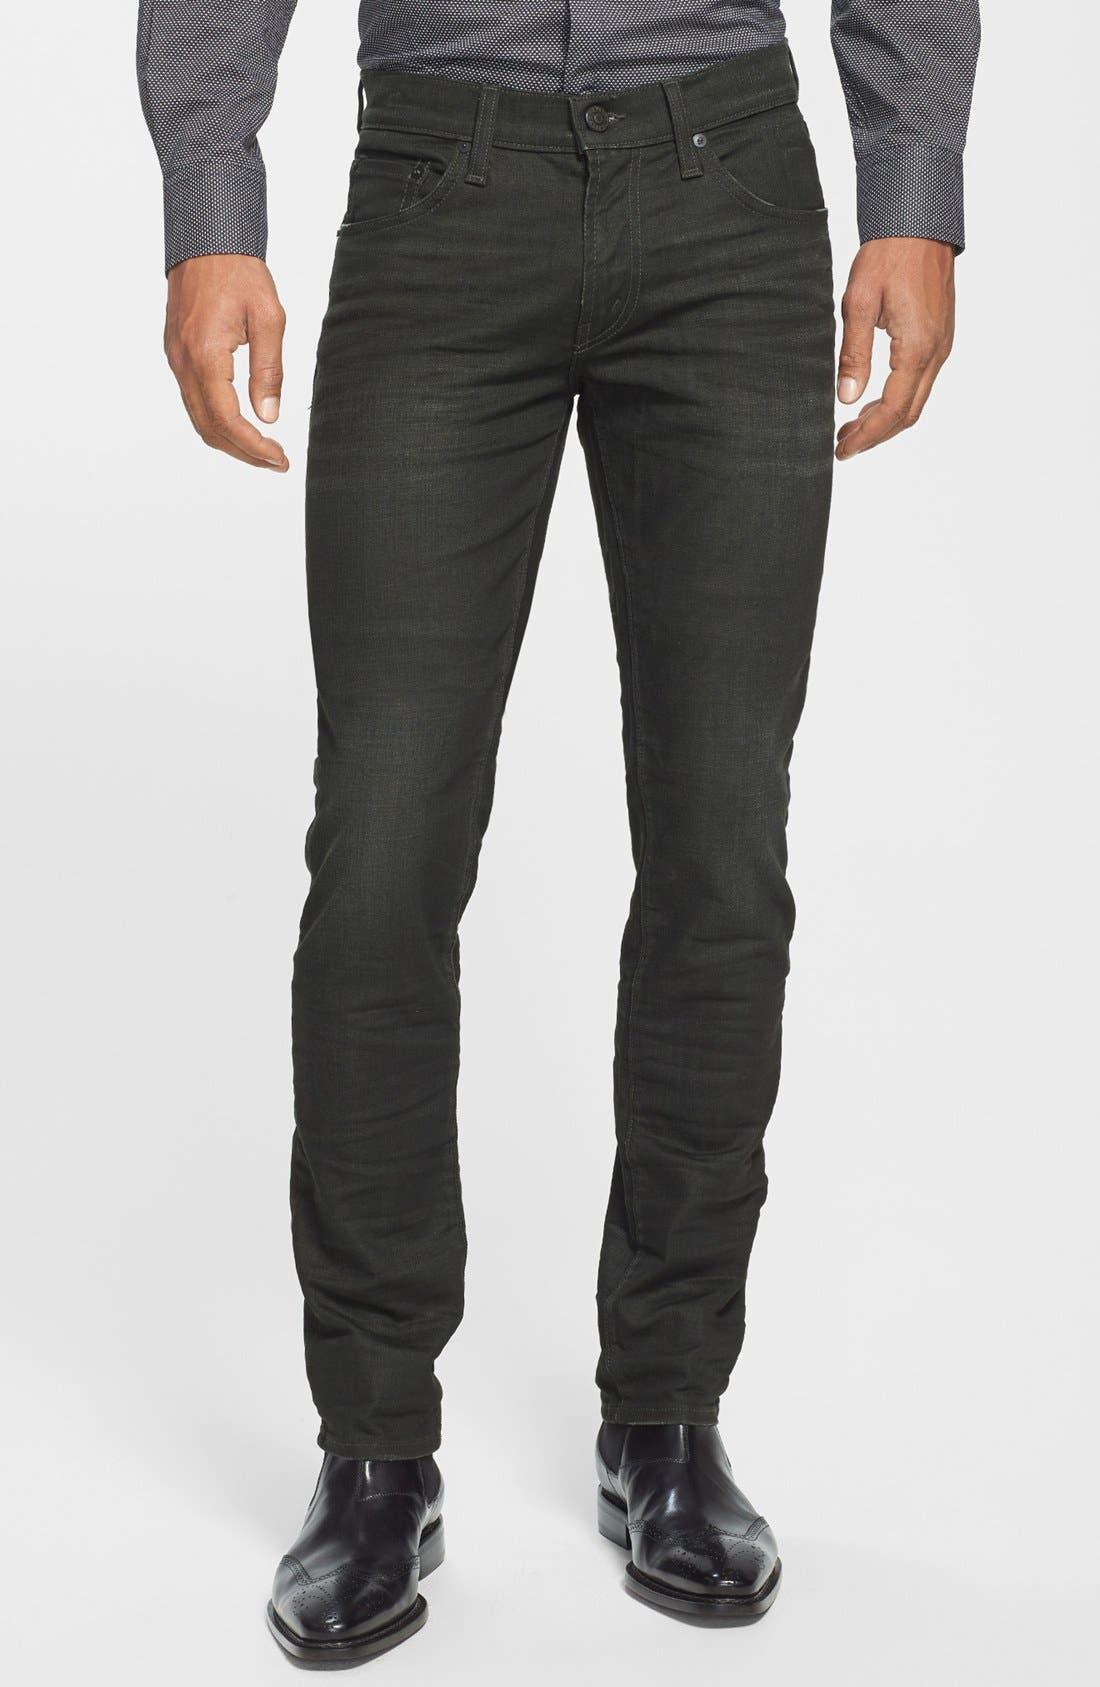 Alternate Image 1 Selected - J Brand 'Mick' Skinny Fit Jeans (Arcane)